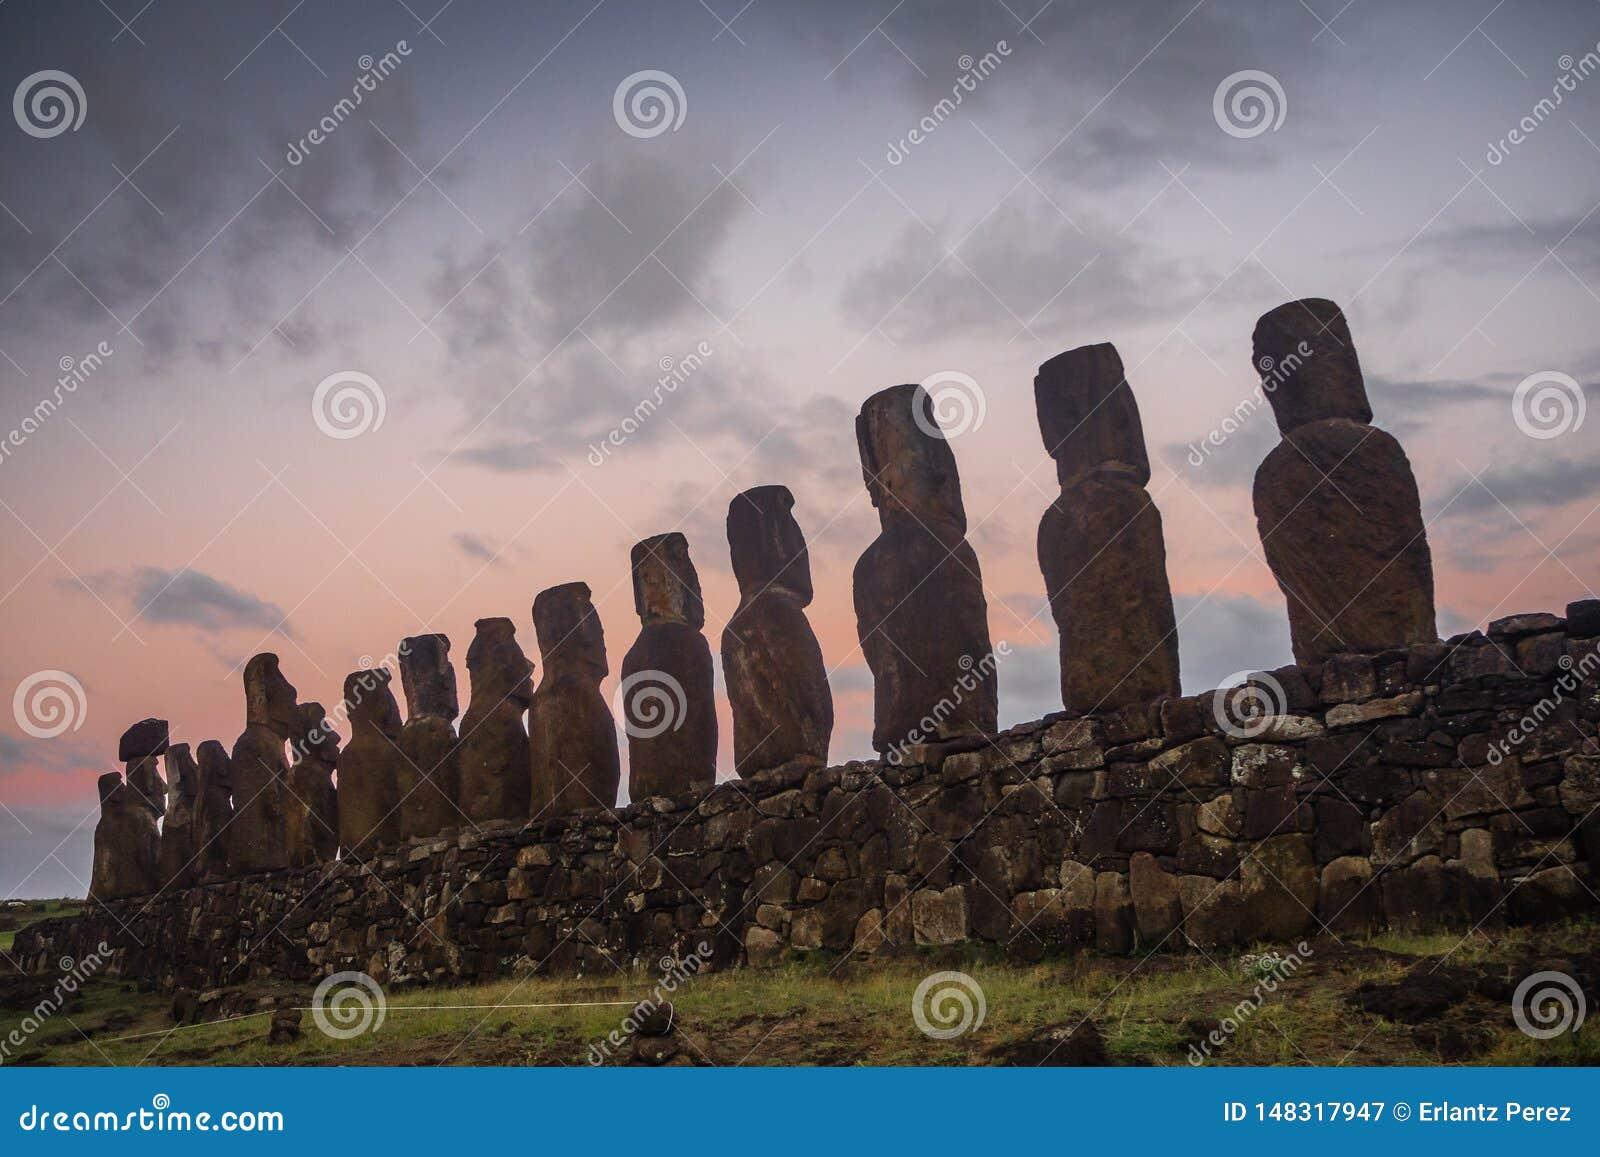 Silhouette Of Nine Of 15 Huge Moai Statues At Ahu